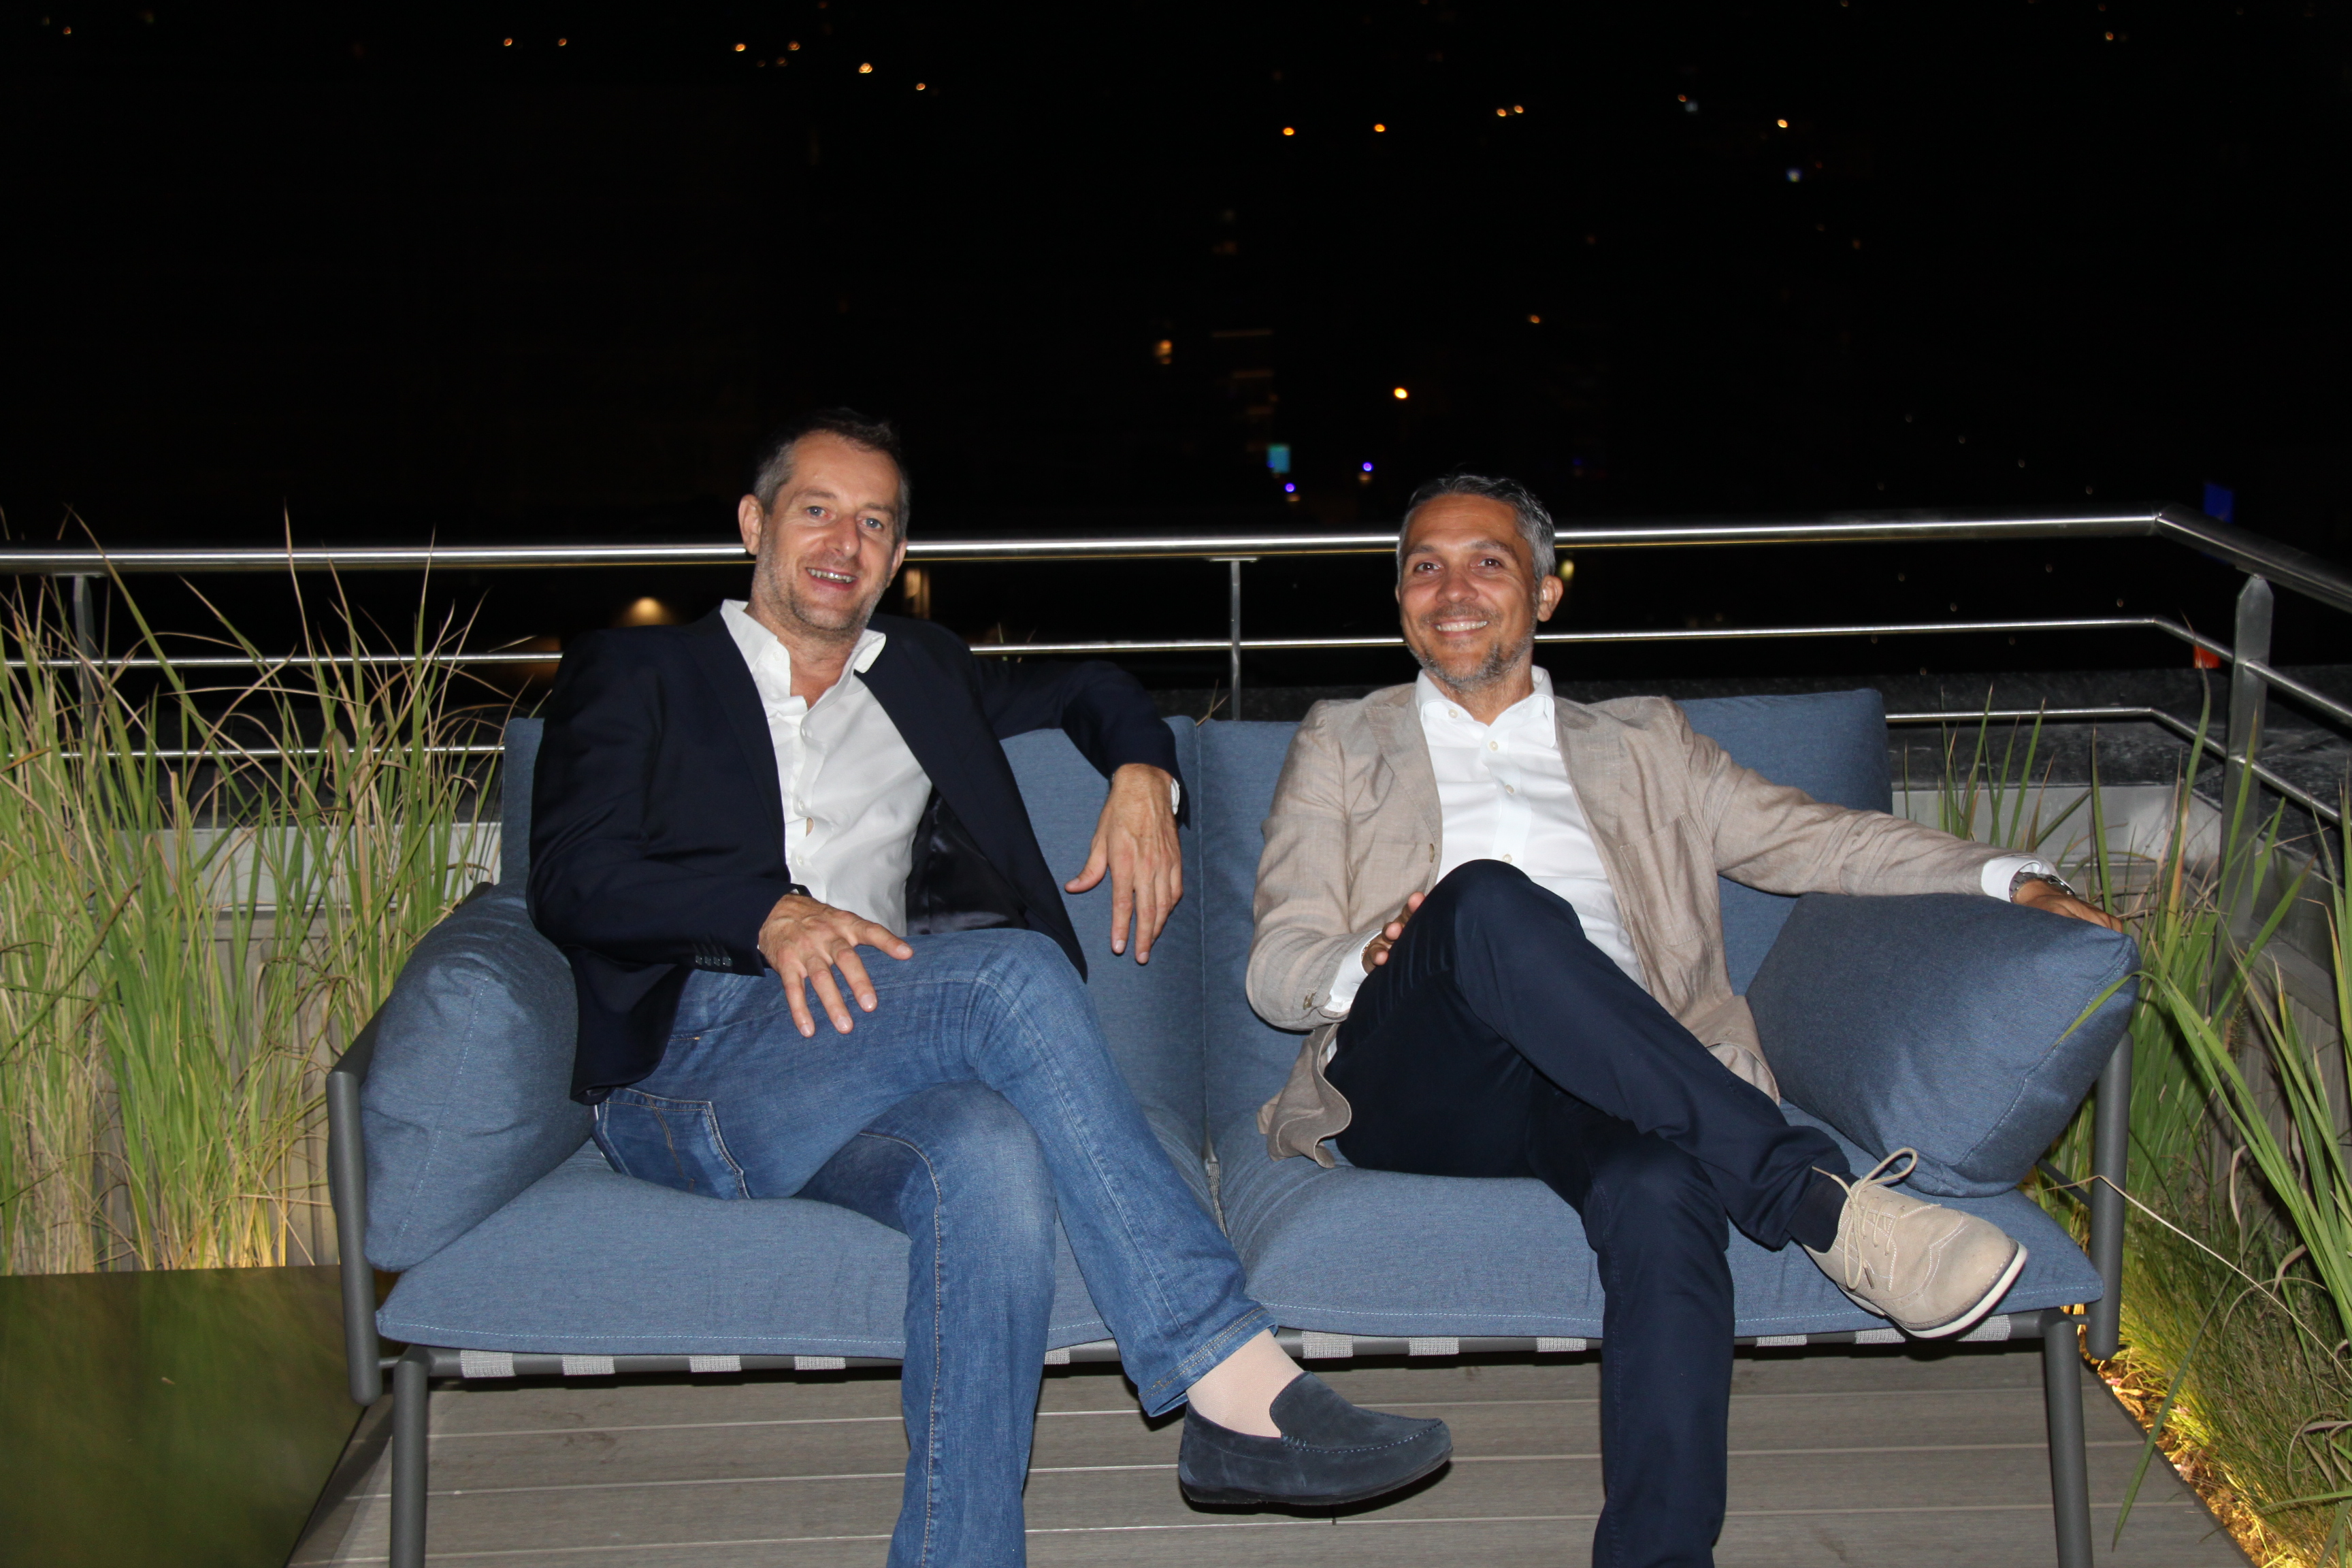 Gianluca-Orazio-e-Diego-Porzio